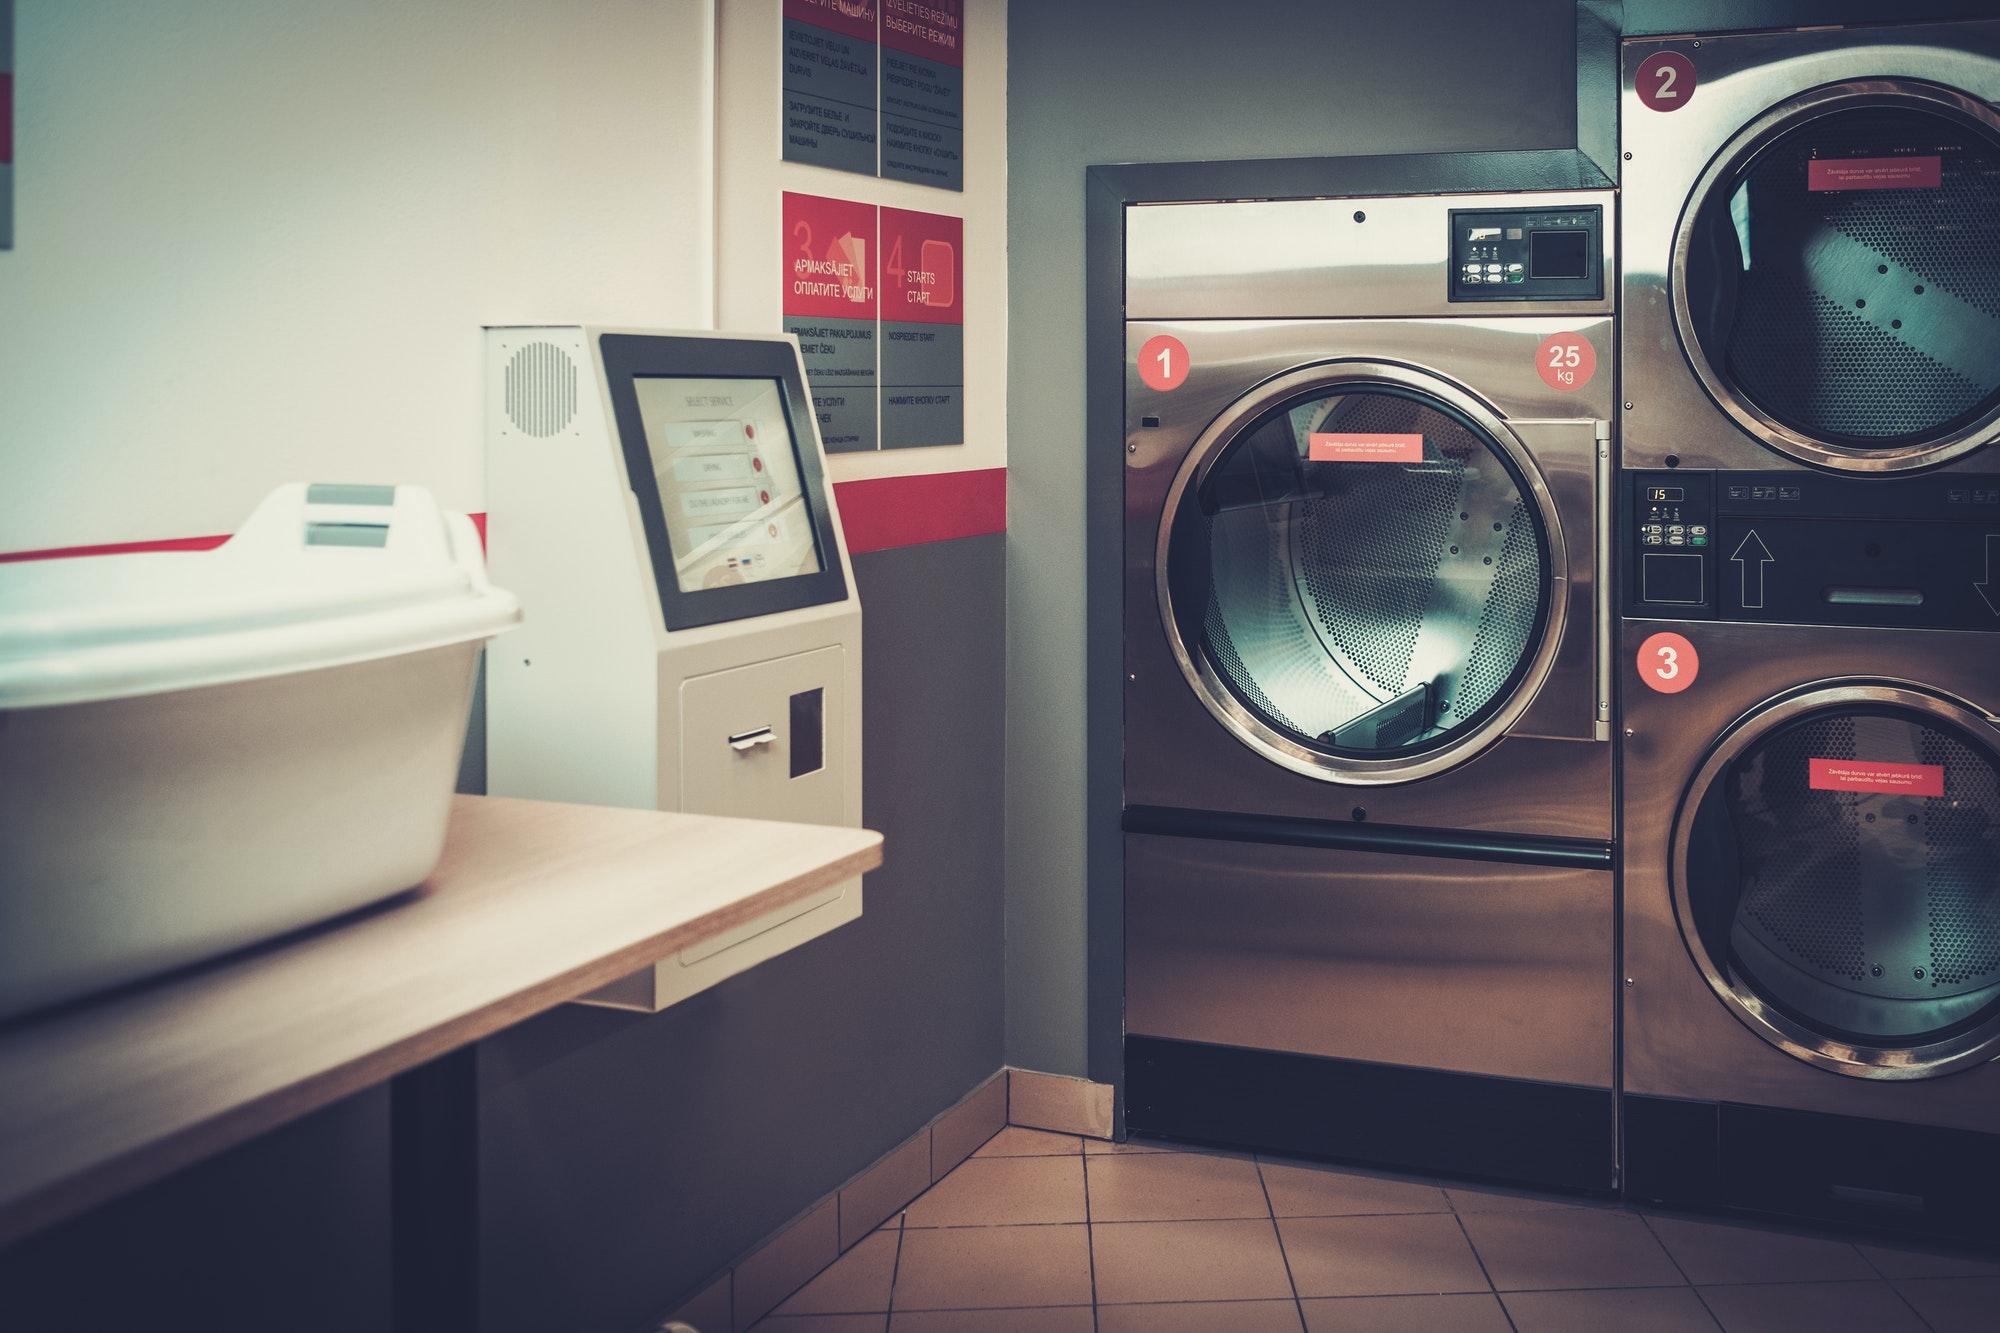 Laundry machines at laundromat shop.